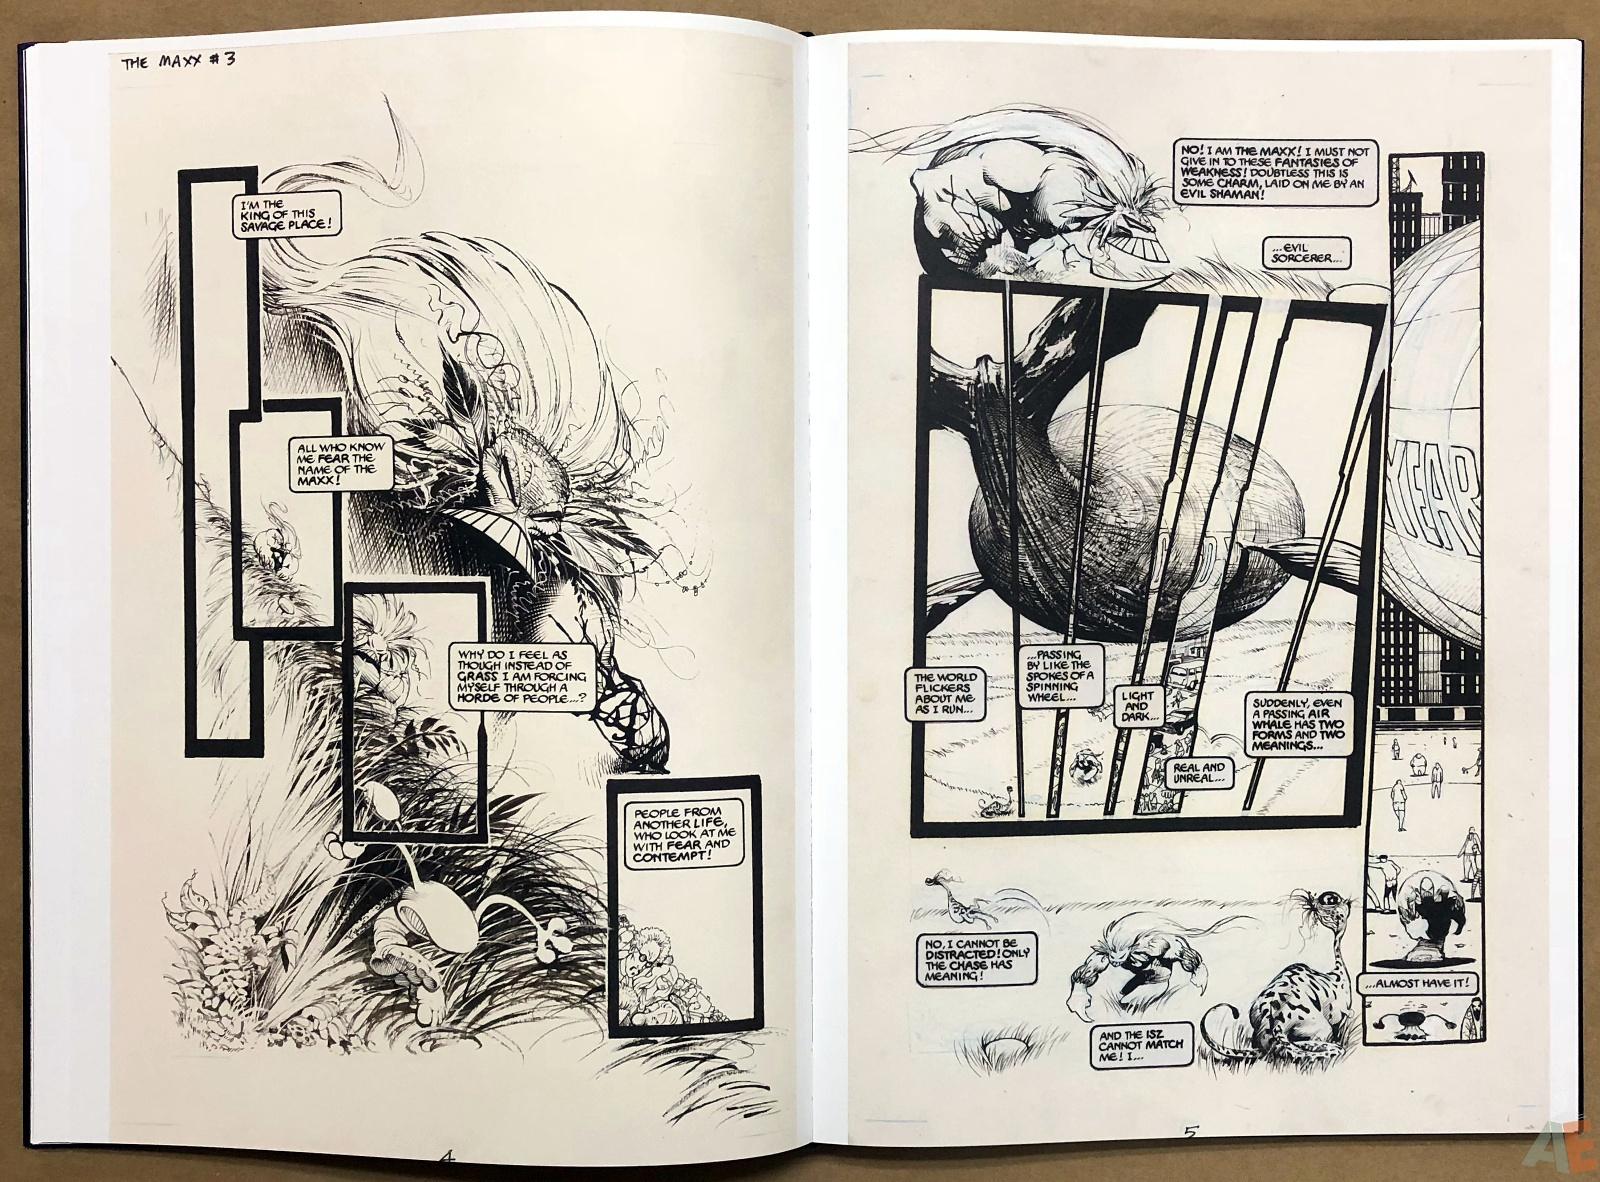 Sam Kieth's The Maxx Artist's Edition